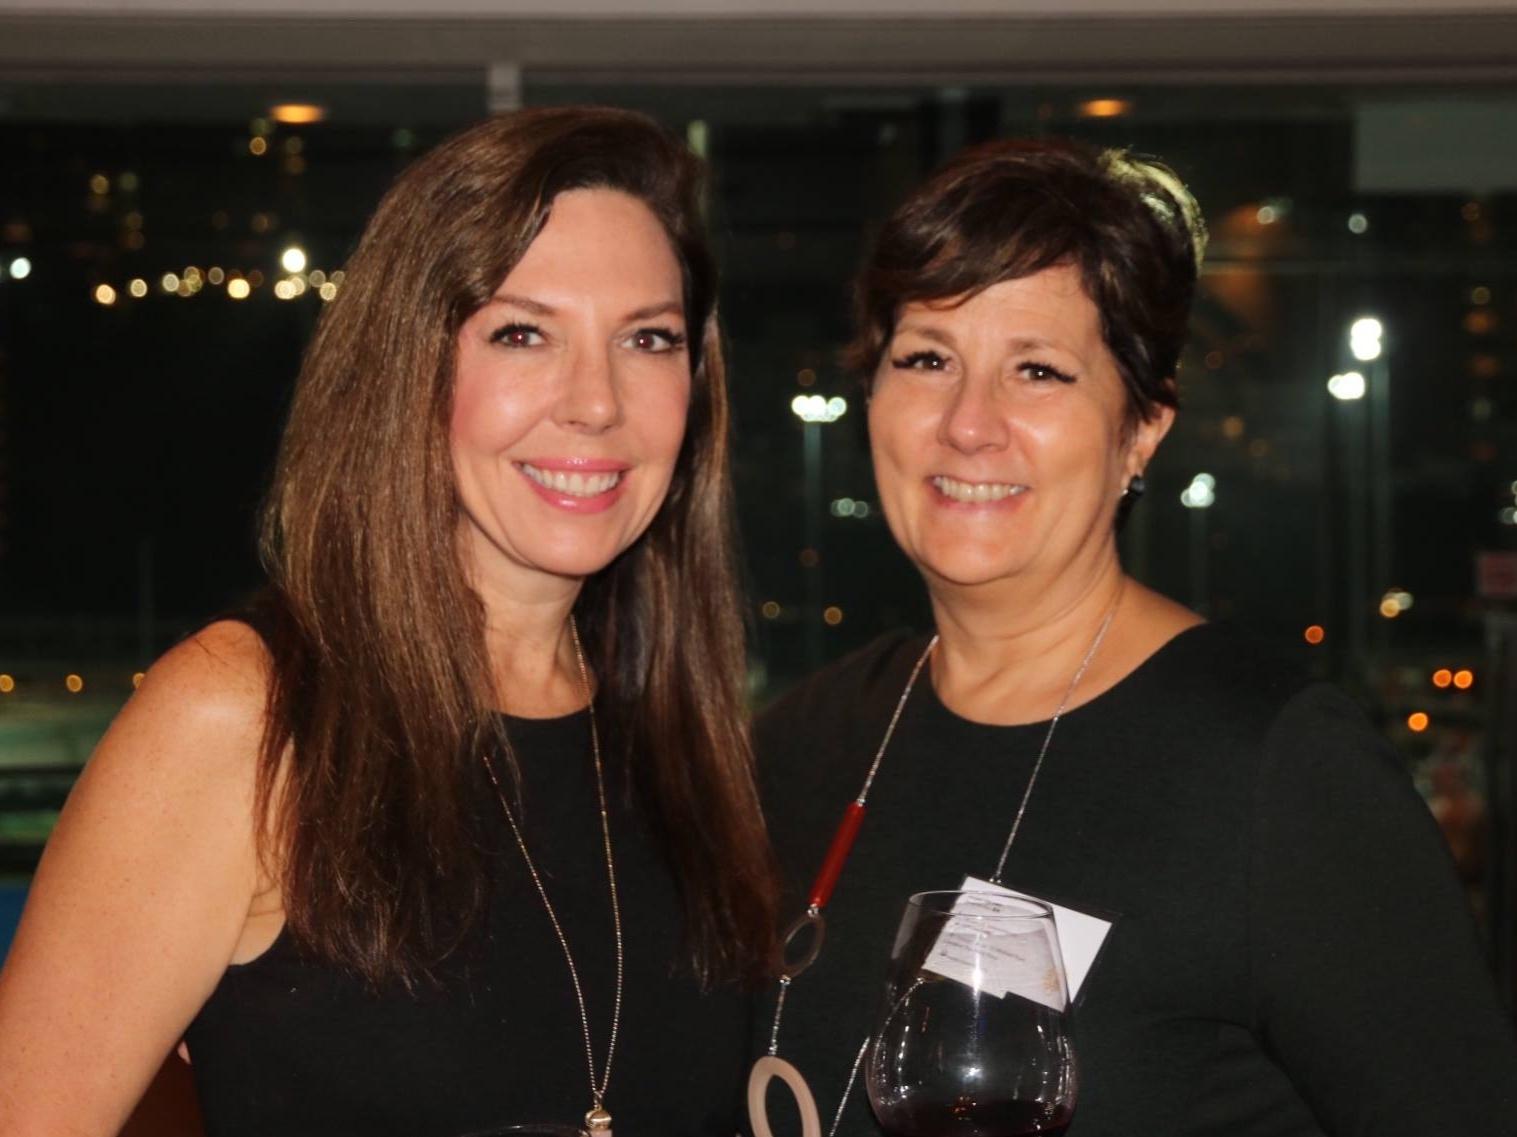 Director Abigail DeLessio with Lynne Anne Davis, President of FleishmanHillard APAC